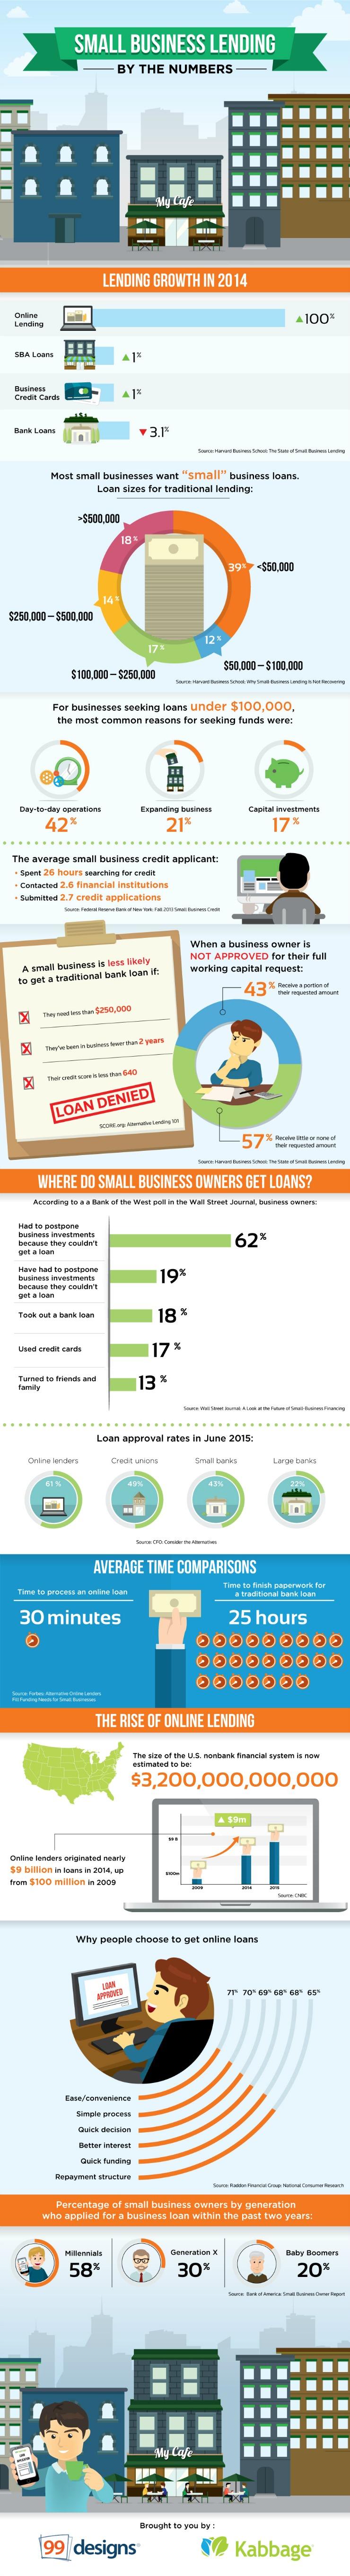 SmallBusinessLendingByTheNumbers_infographic Small